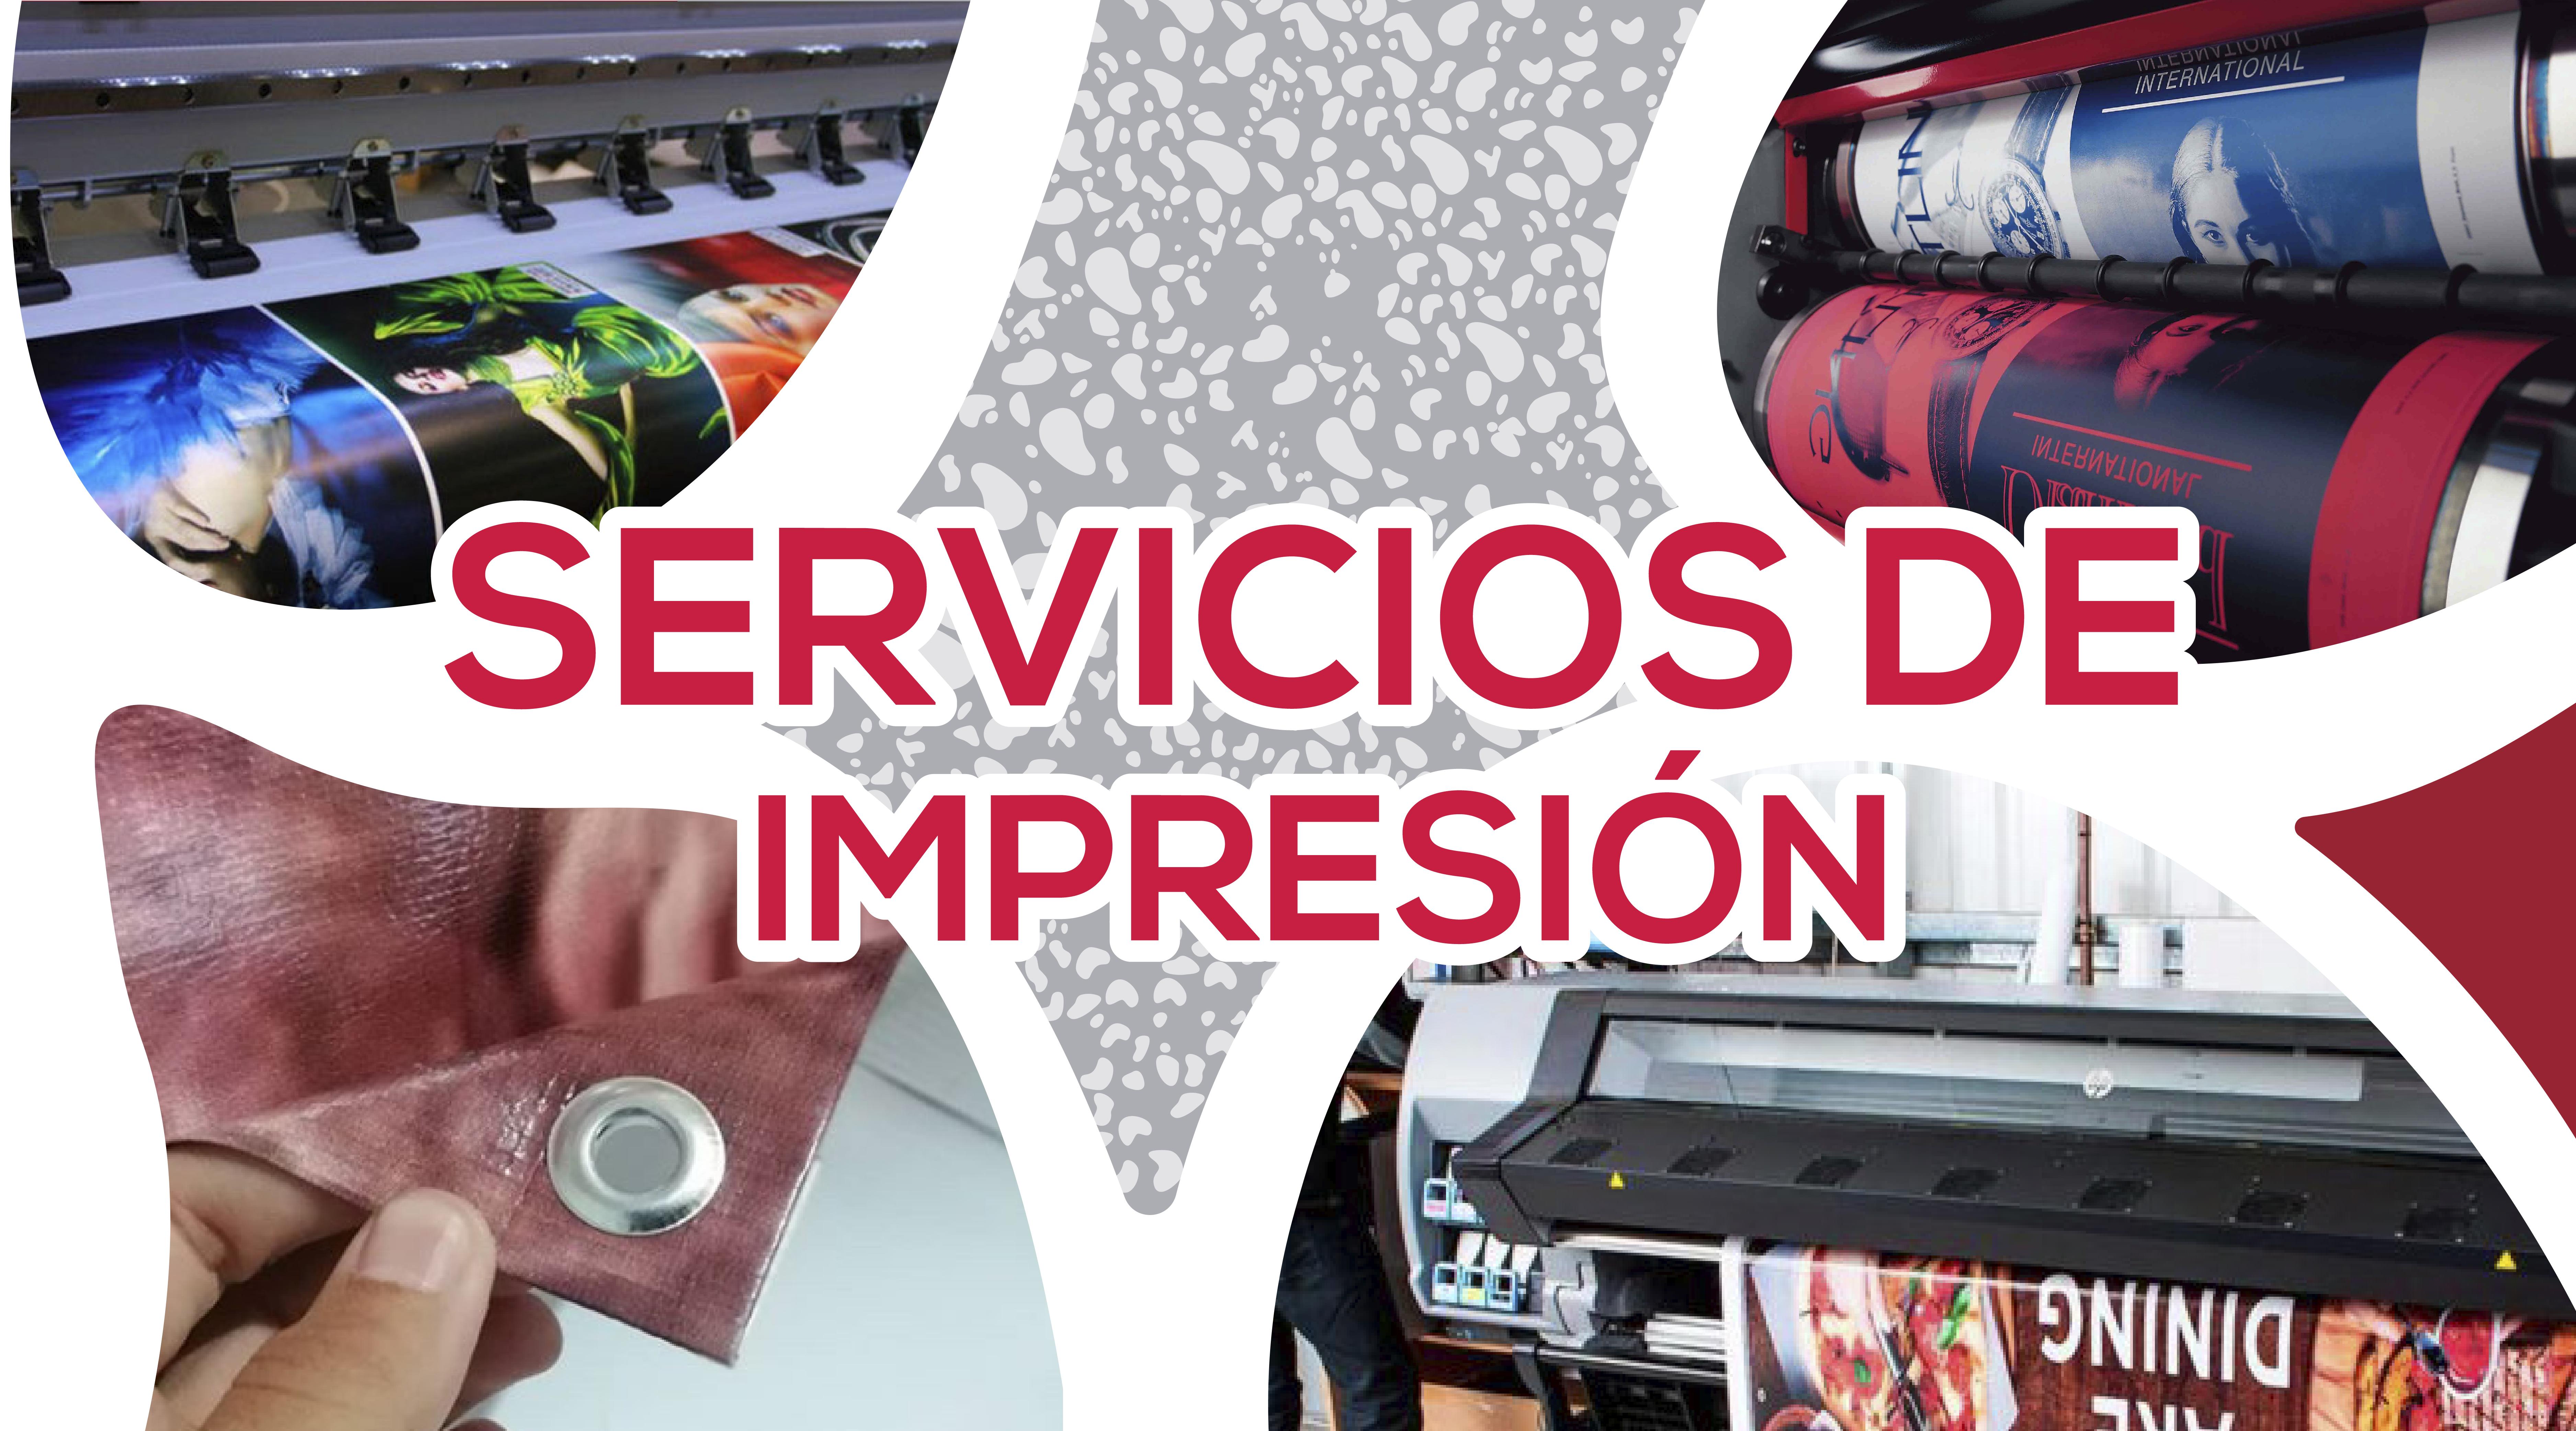 SERVICIOS DE IMPRESIÓN-NAGUAL-CREATIVO-SOLUCIONES-EN-DISEÑO-GRÁFICO-E-IMPRESIÓN